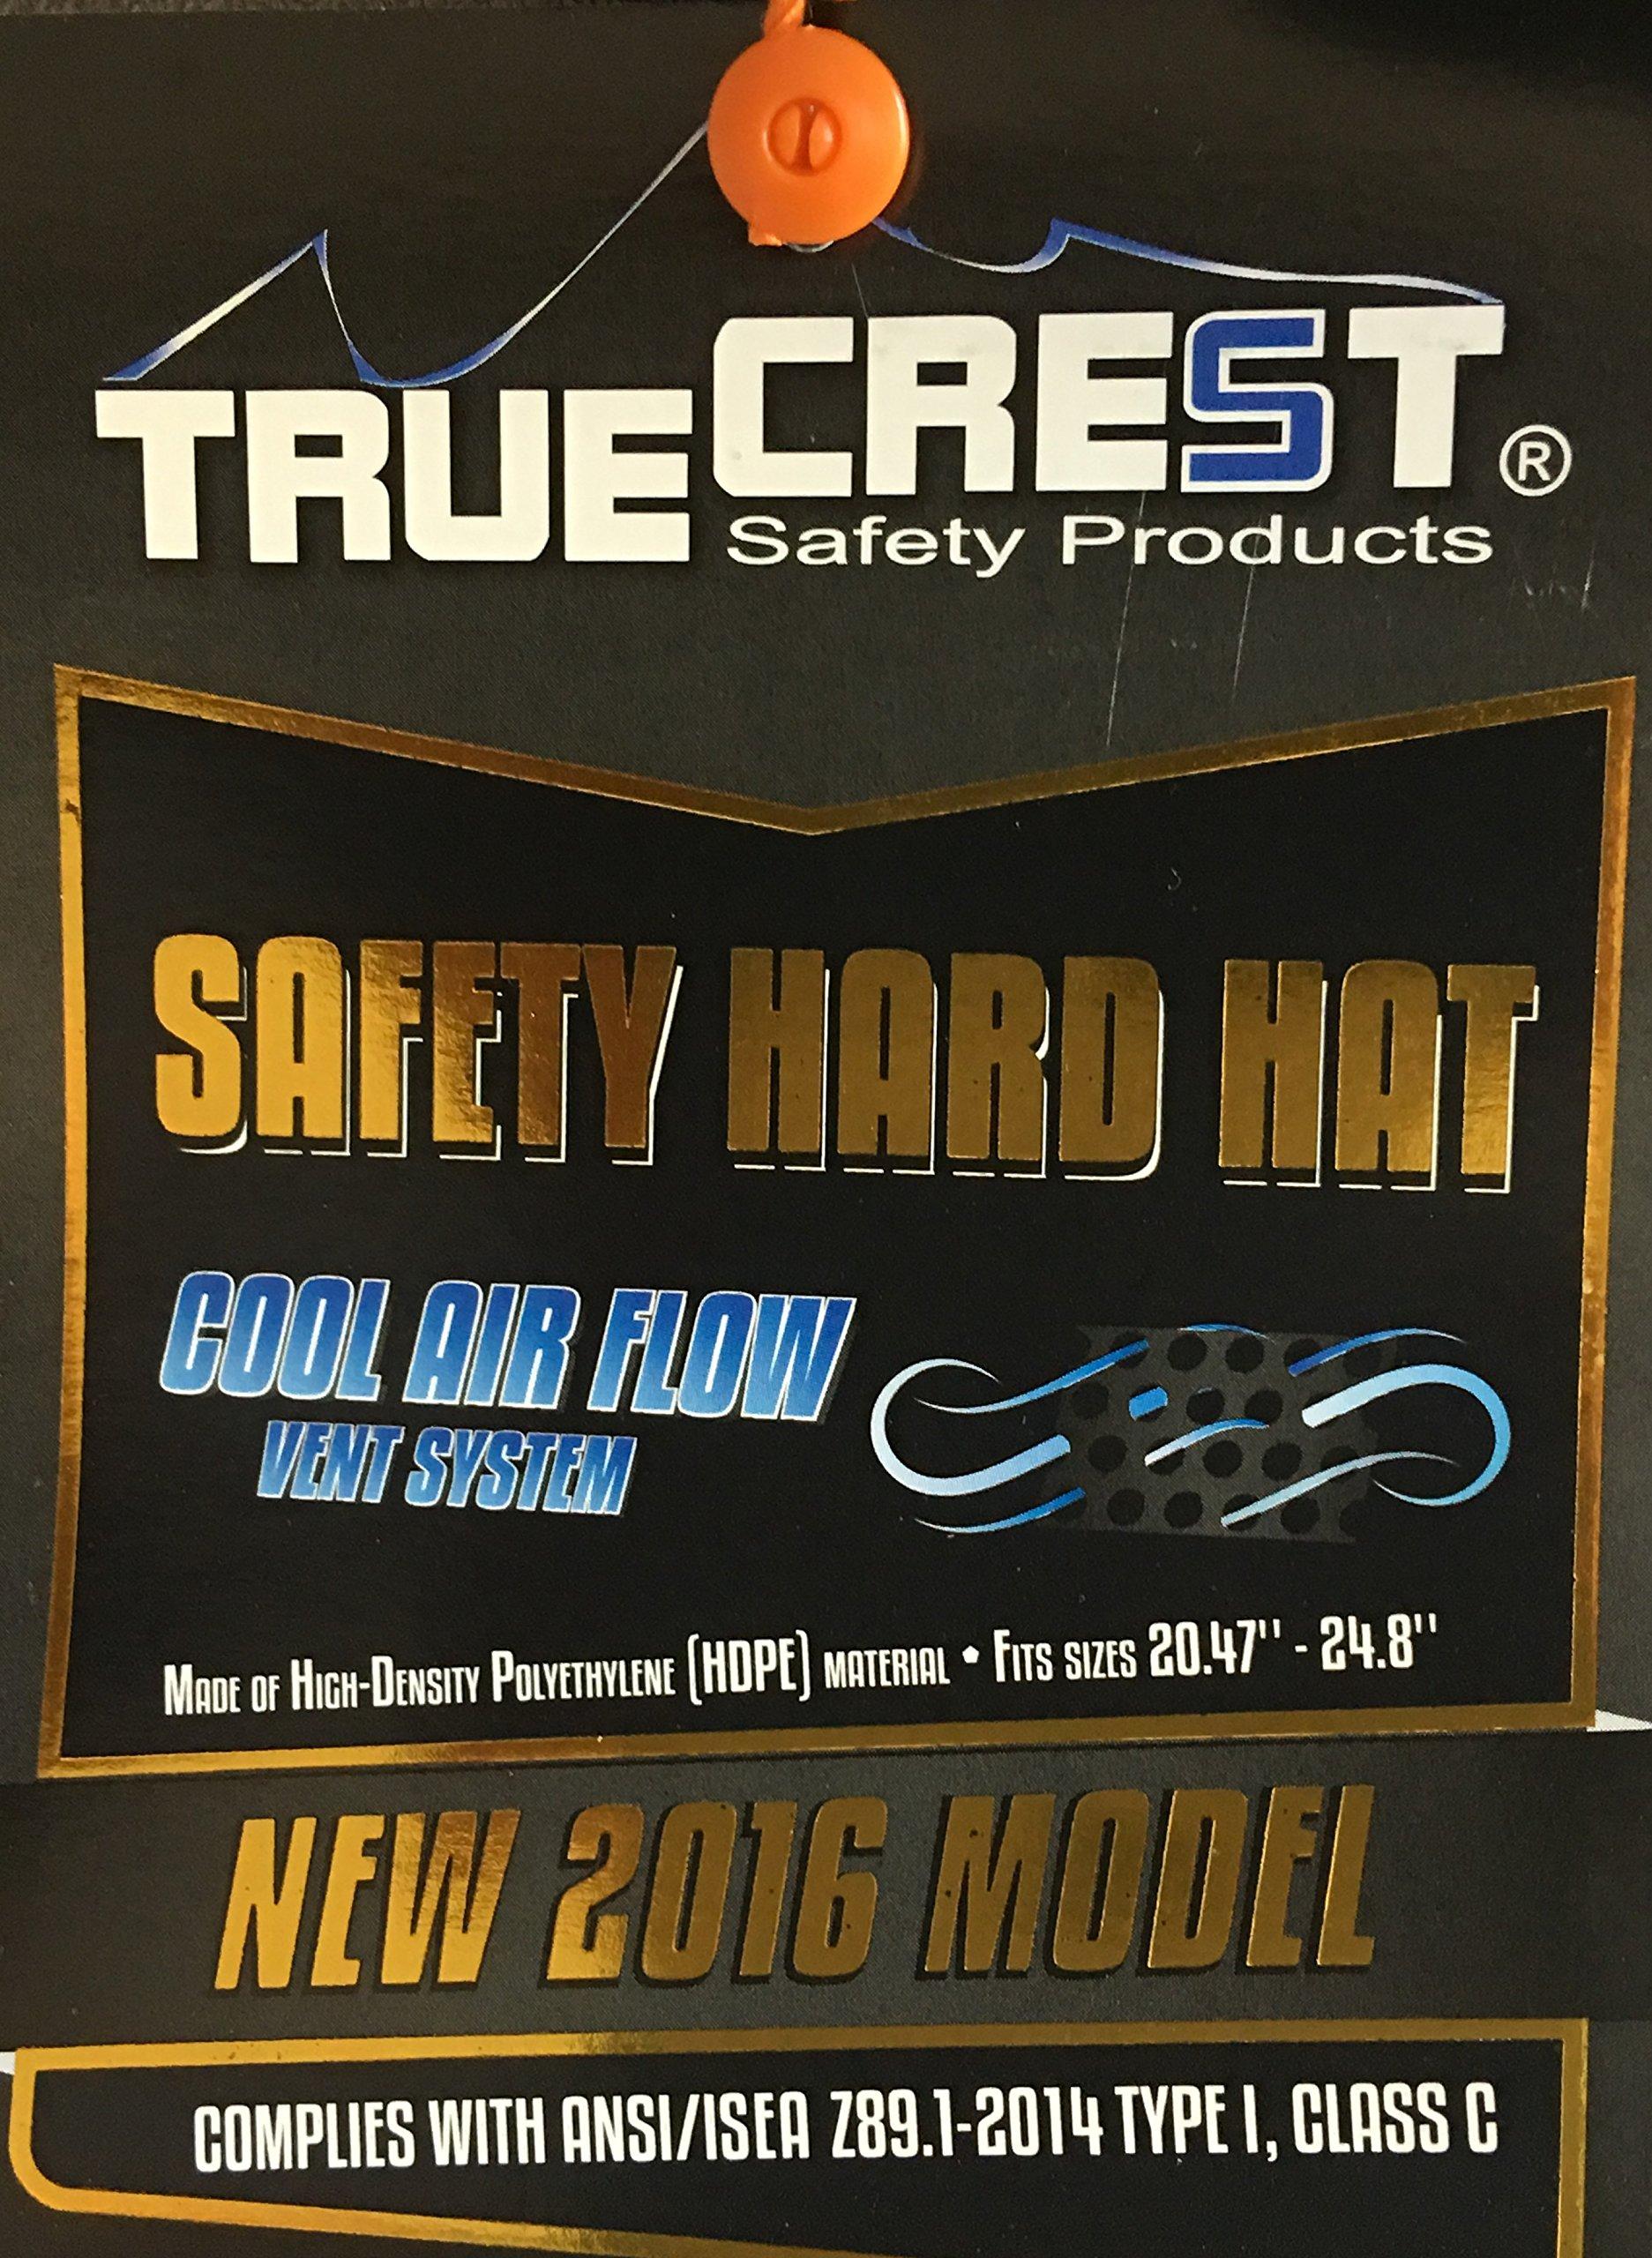 HNTE-TAN Fiberglass Hard Hat Safety Full Brim Helmet, Nylon Ratchet Suspension, 4-Point, {Top Impact} Safety Hard Hat Cool Air Flow Vent System by Truecrest Safety Helmet (Image #5)